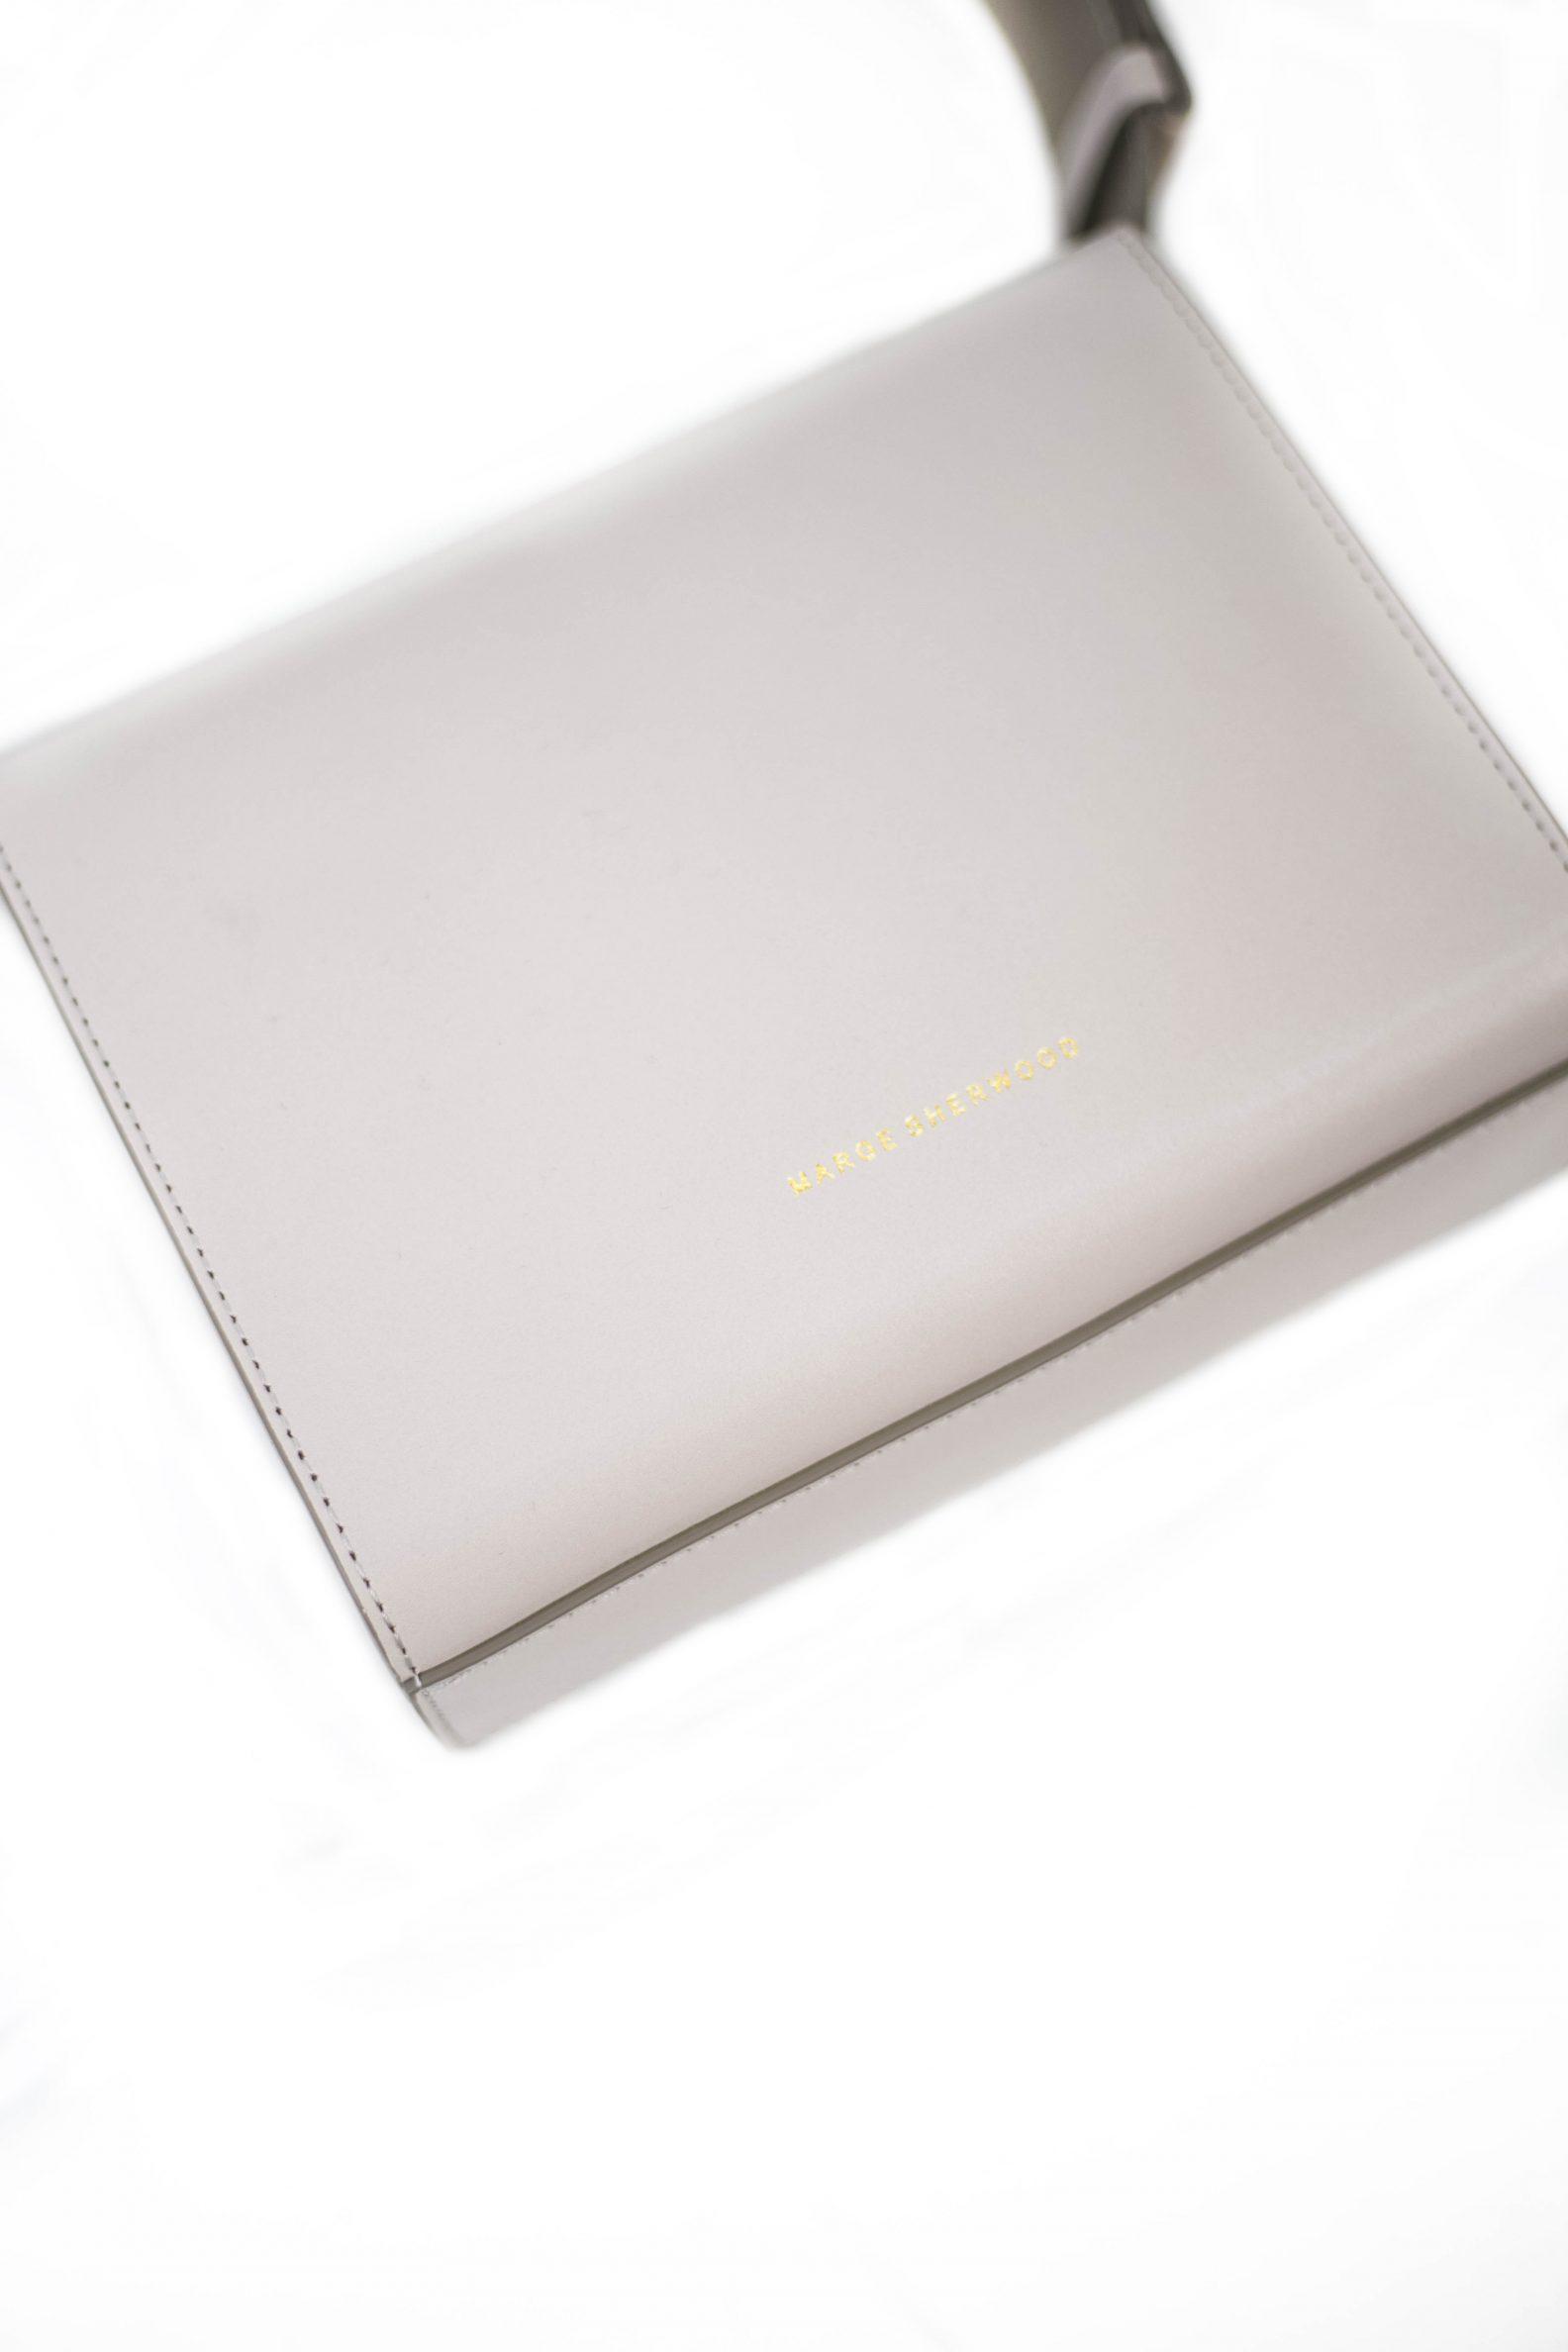 4-sac-cuir-rabat-gris-clair-affaires-etrangeres-paris-mode-coreenne-besides-kimchi-jpg